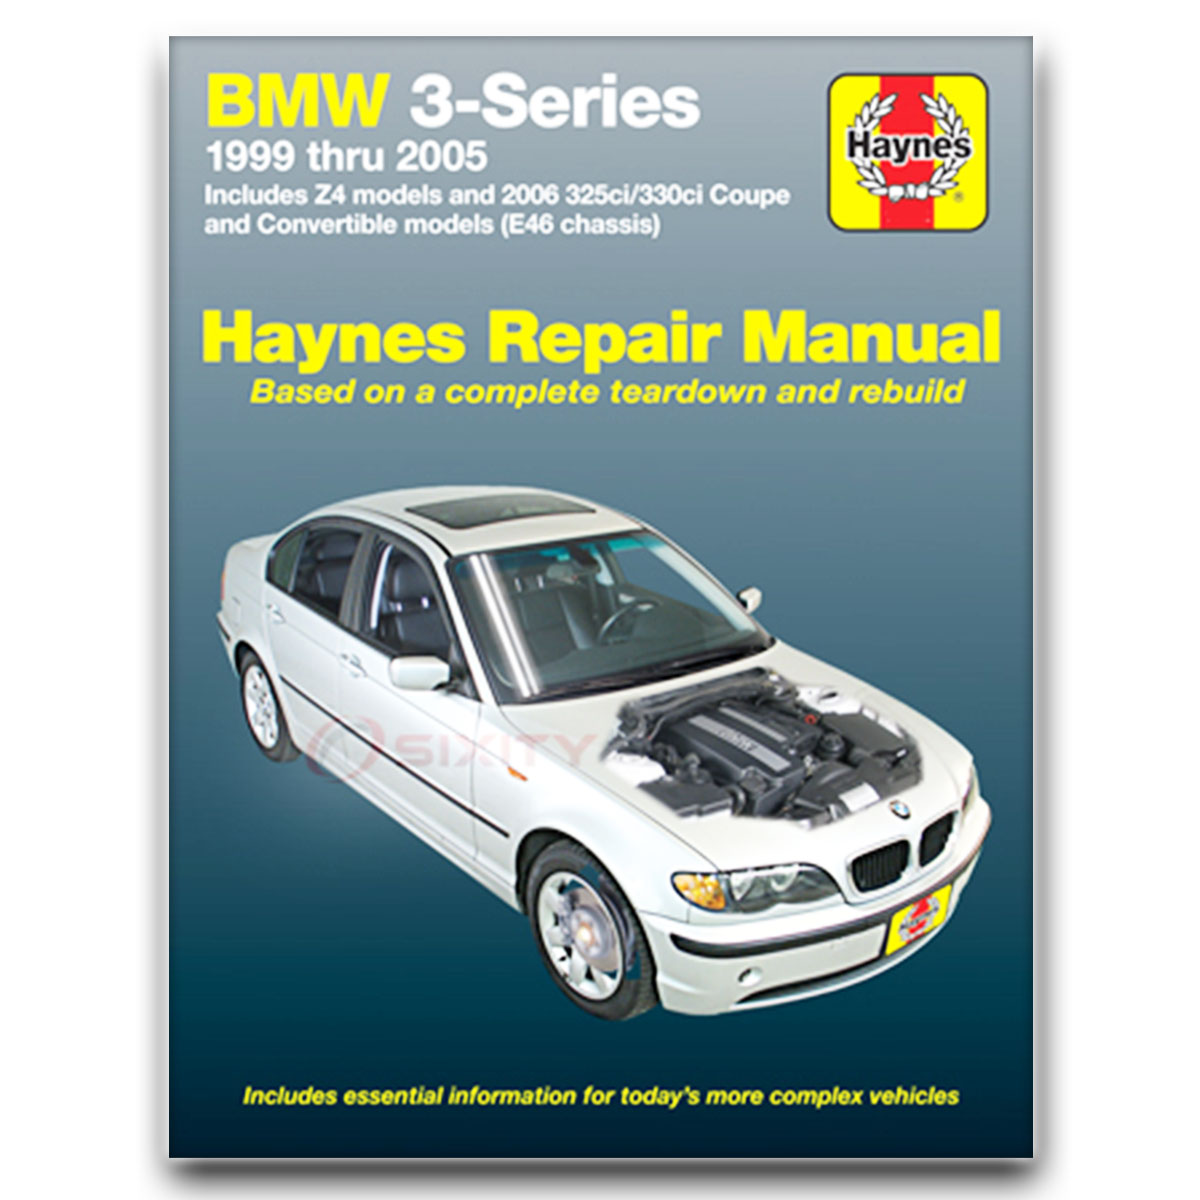 Haynes Repair Manual for BMW 330i Base Shop Service Garage Book xz